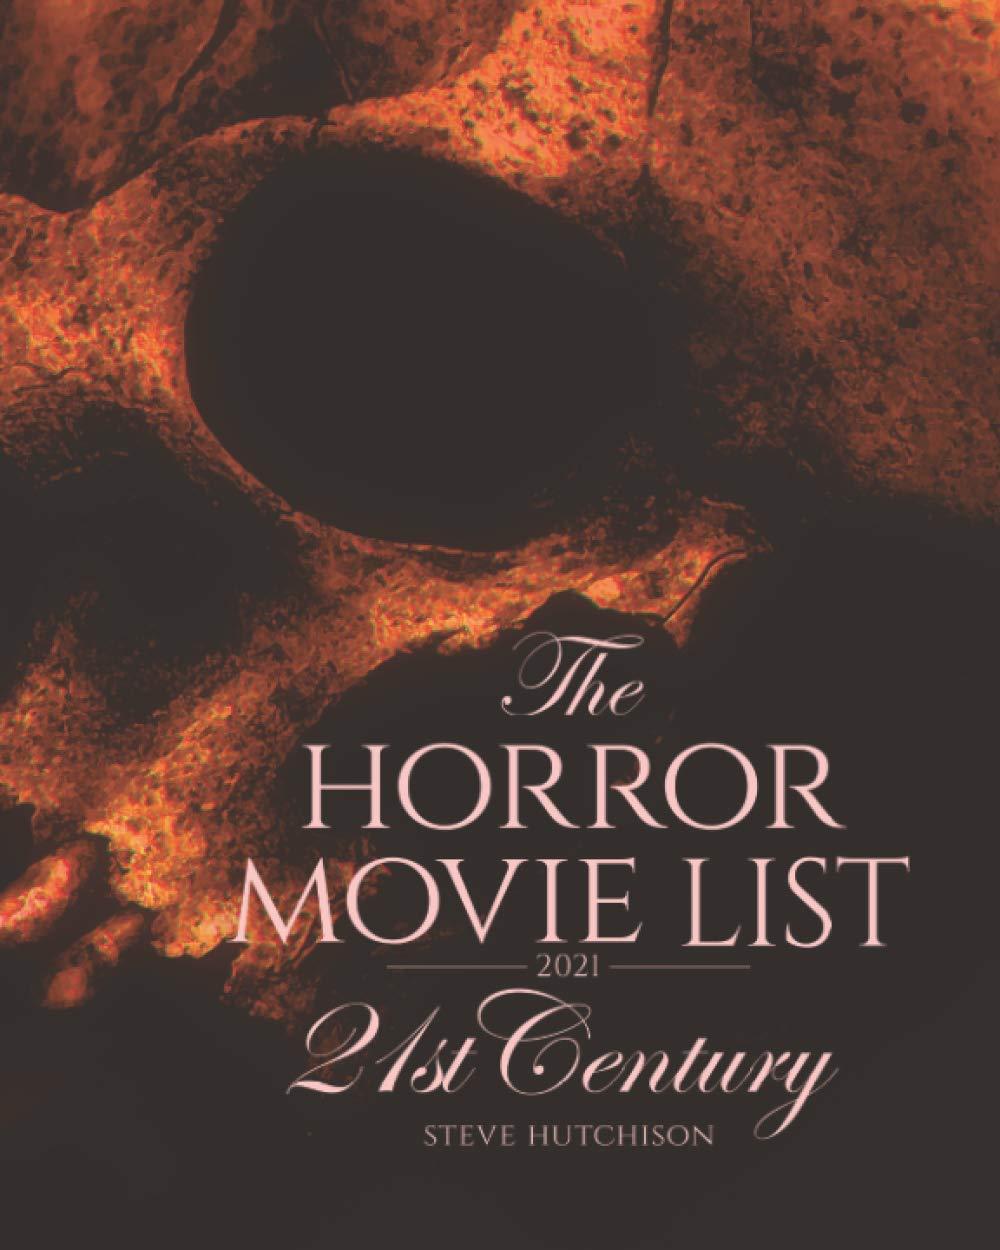 The Horror Movie List 20 20st Century The Horror Movie List ...